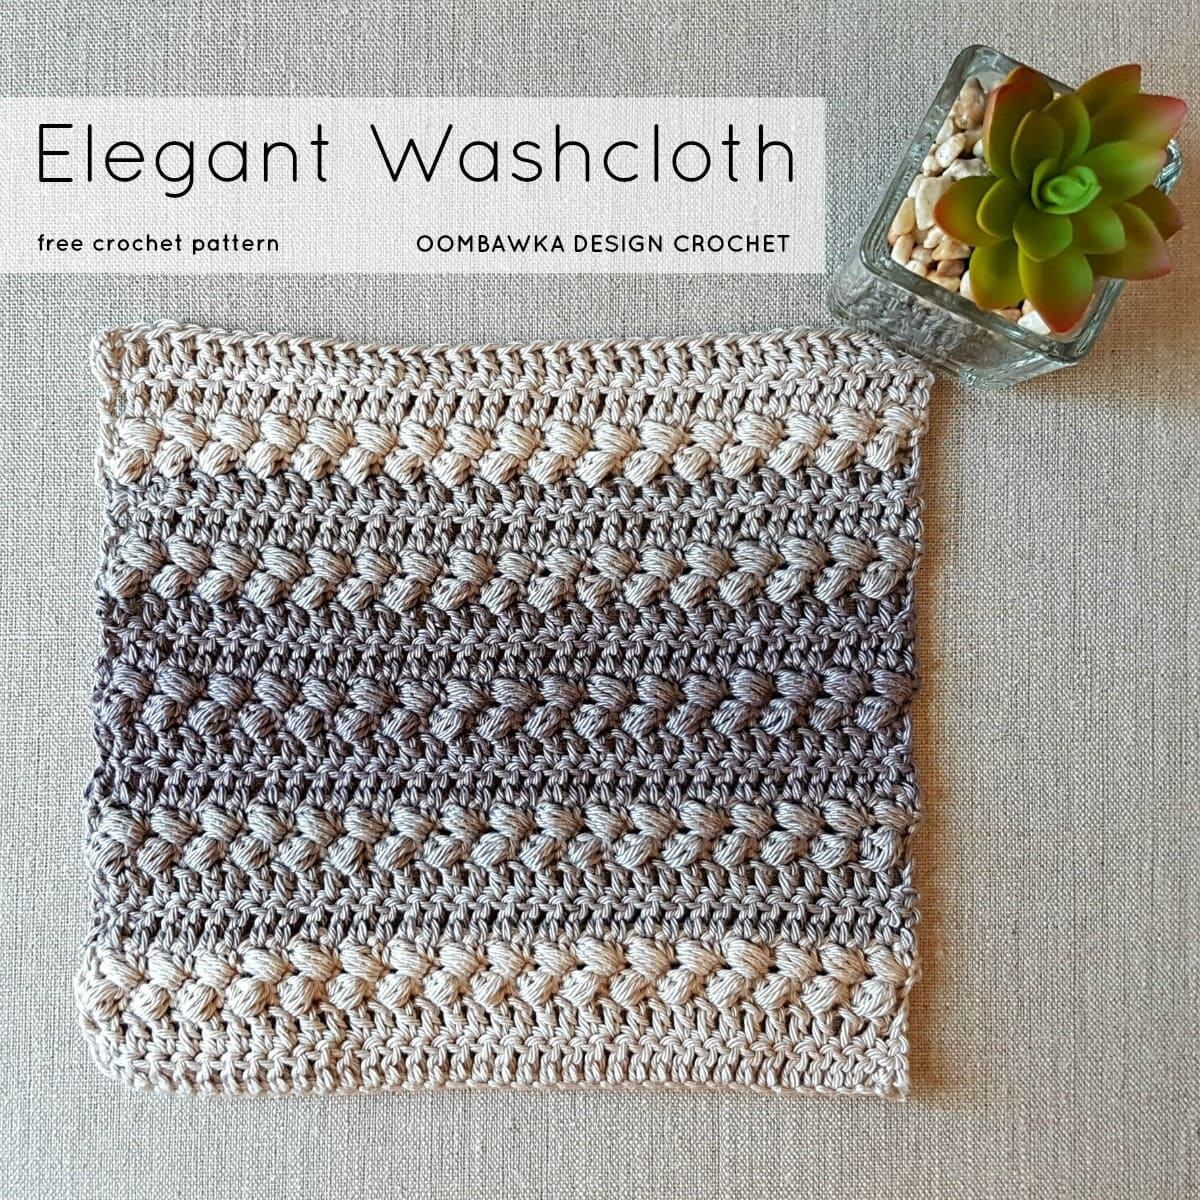 Elegant Washcloth Pattern Oombawka Design Crochet